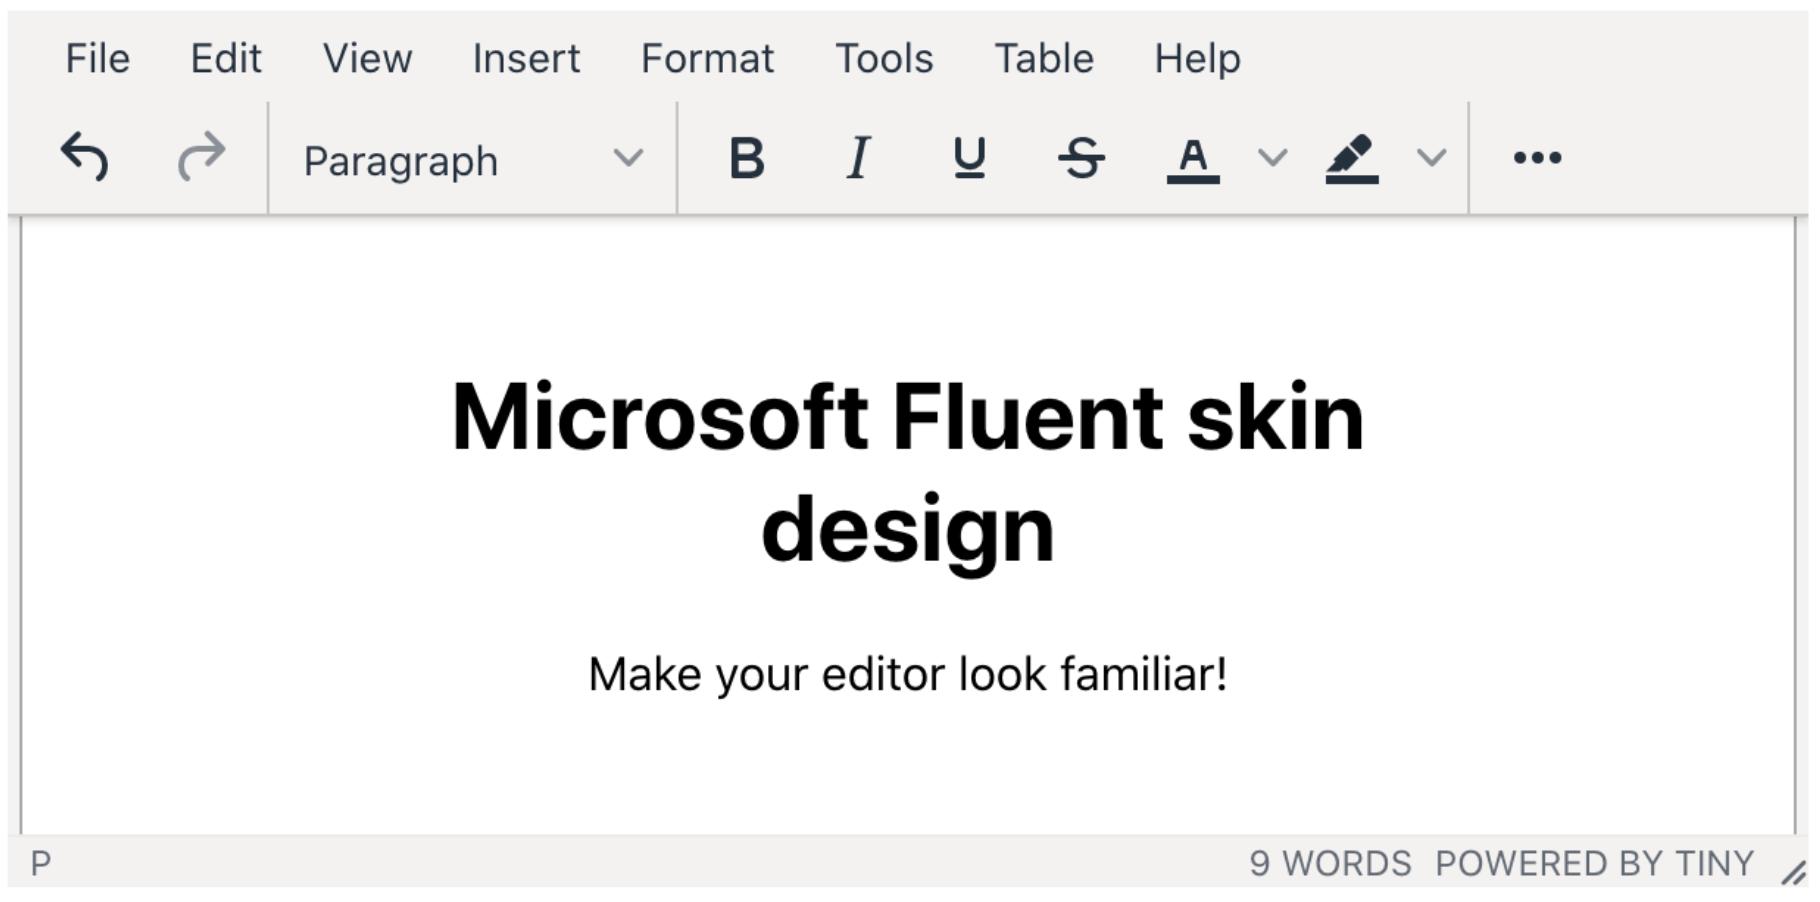 Image of the fluent skin design